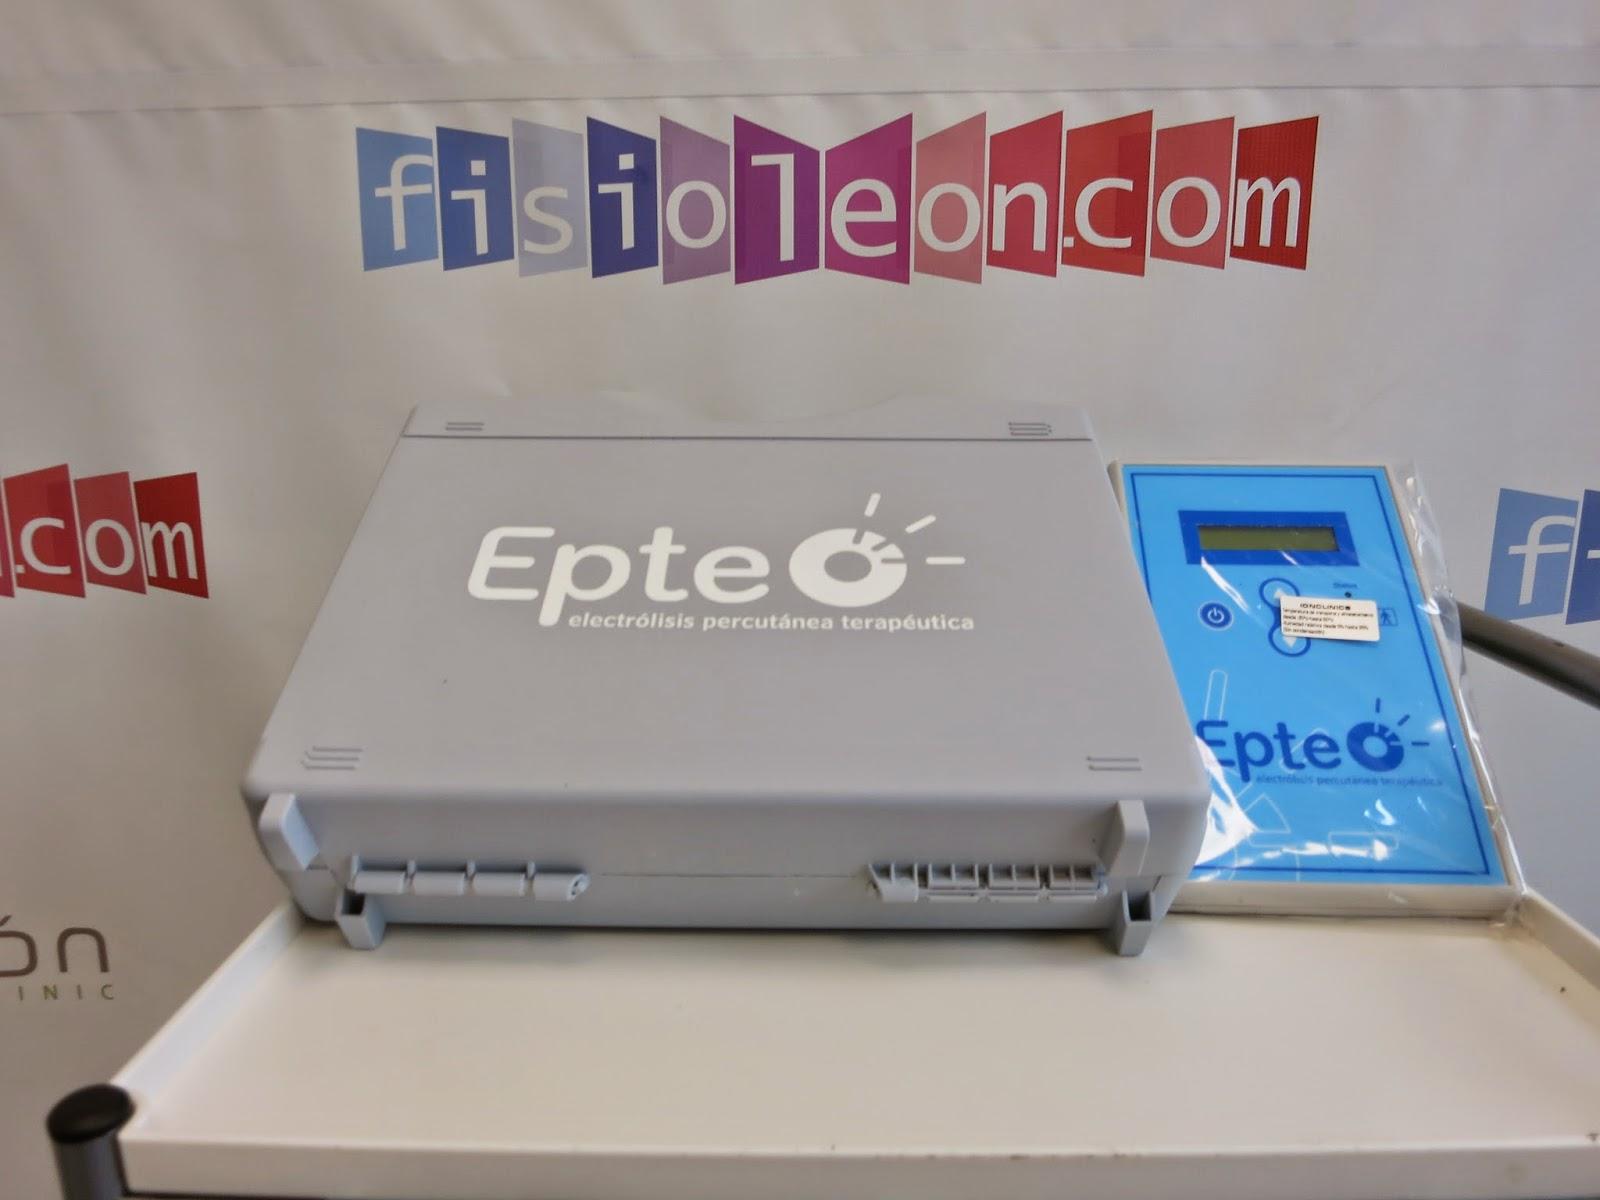 Epte electrolisis percutanea terapeutica